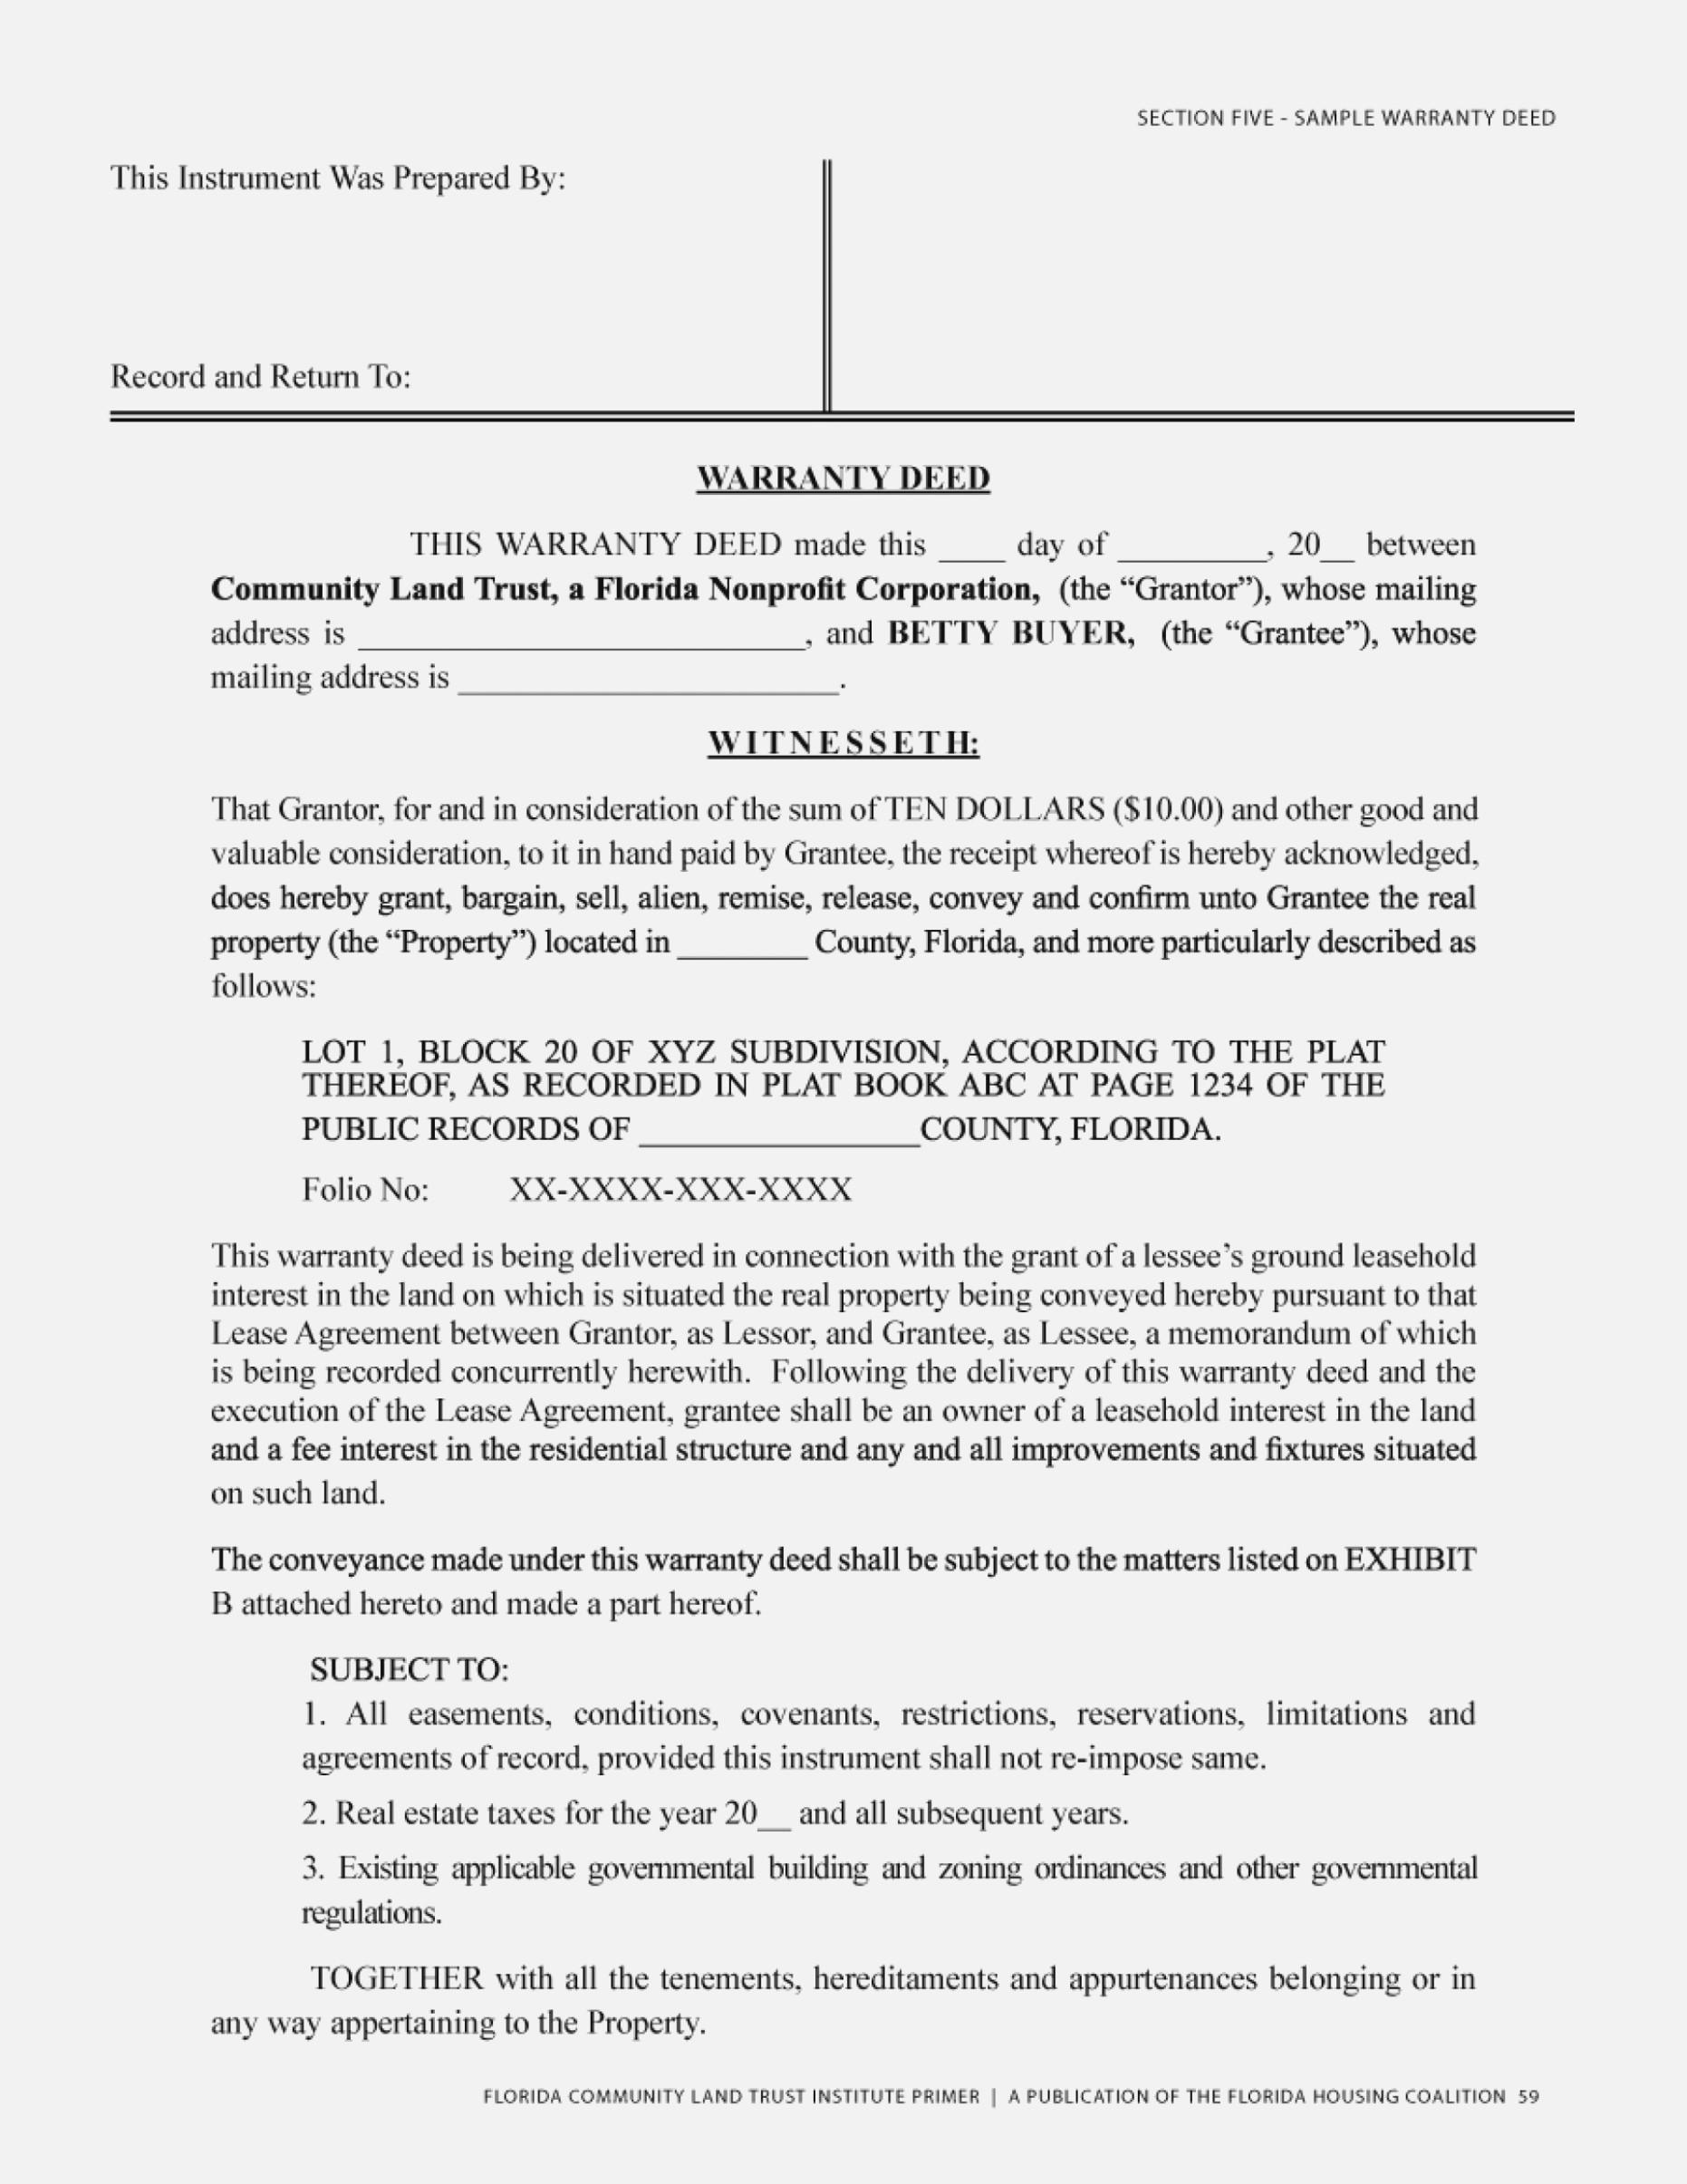 Special Warranty Deed Texas Form Free